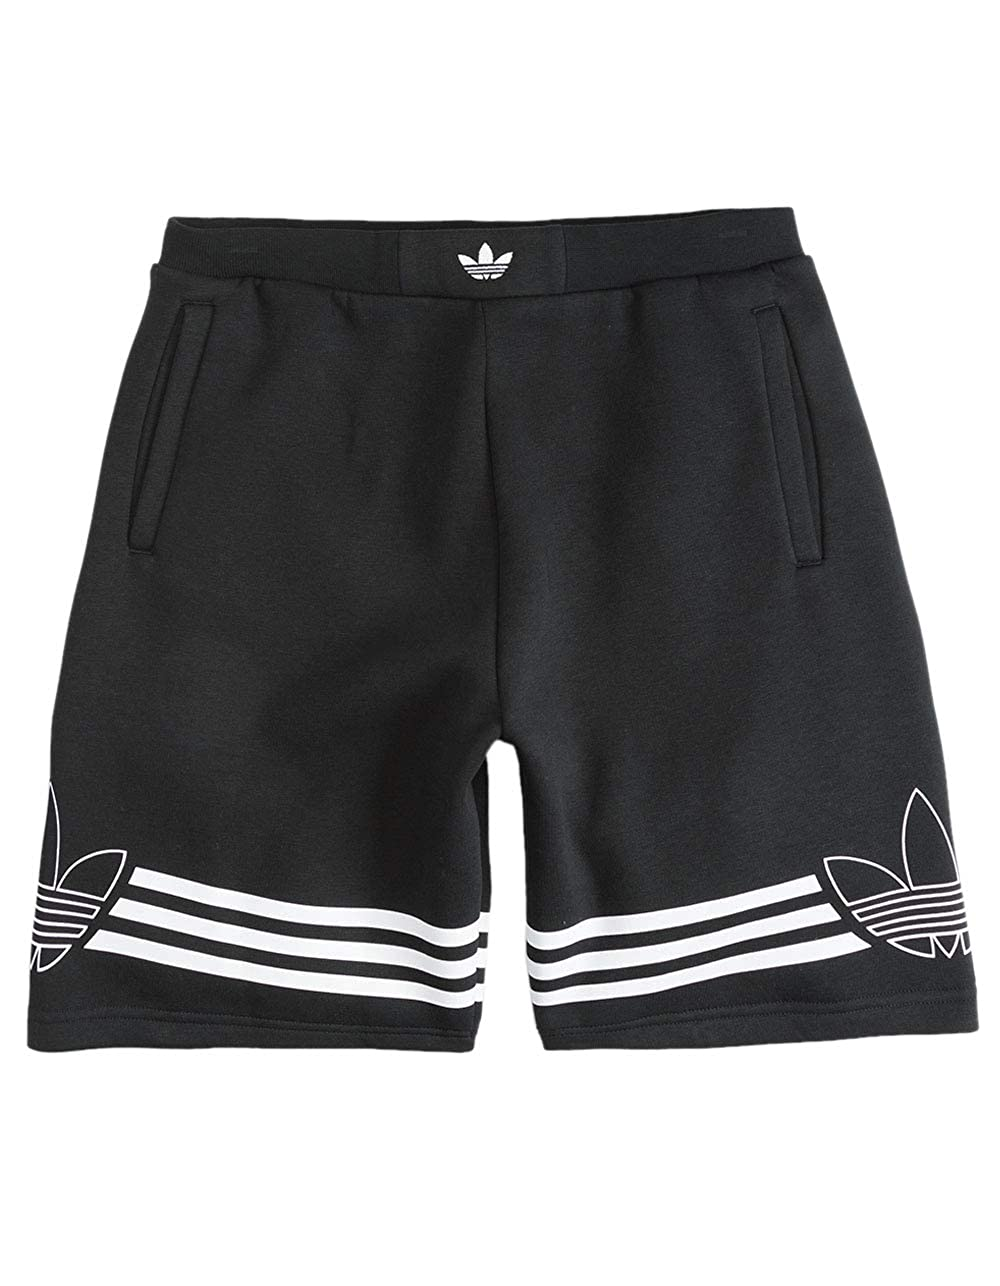 f28807ecee8e1 Amazon.com: adidas Outline Boys Sweat Shorts, Black, Medium: Clothing